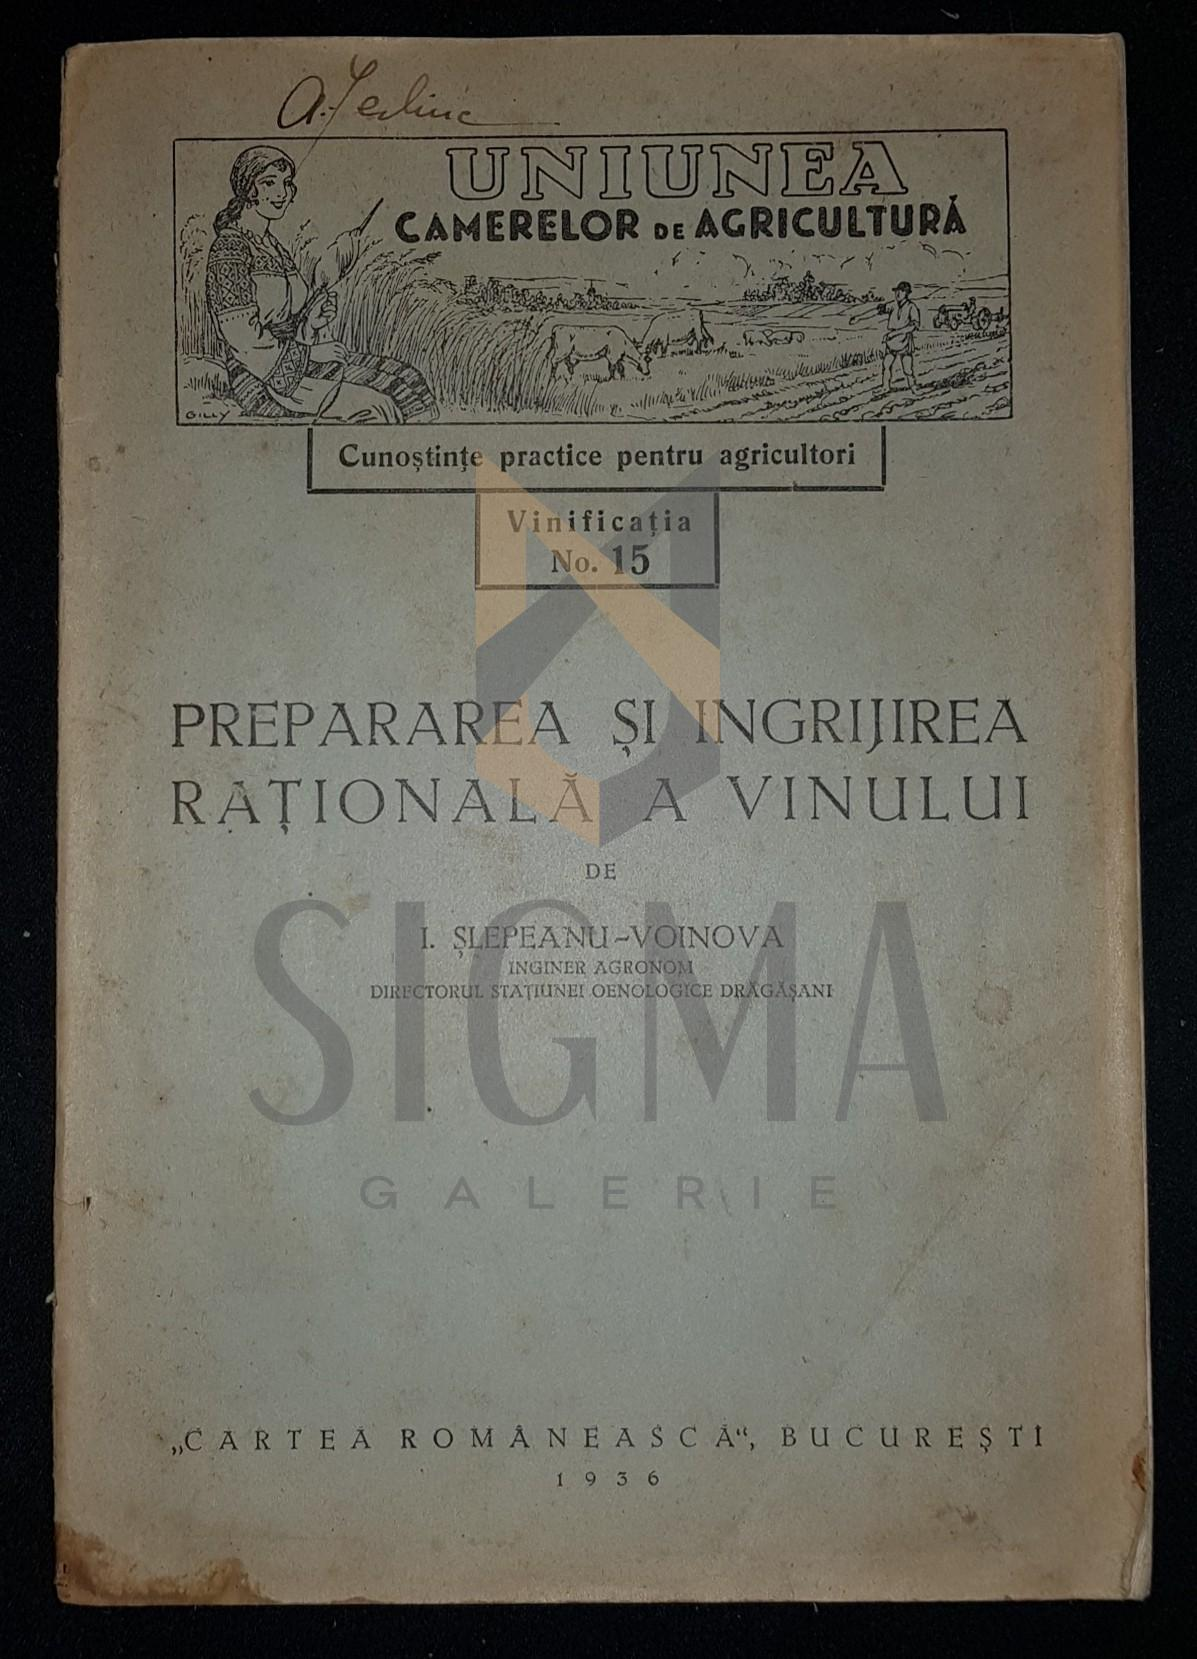 SLEPEANU-VOINOVA I. (Inginer Agronom, Directorul Statiunei Oenologice Dragasani)